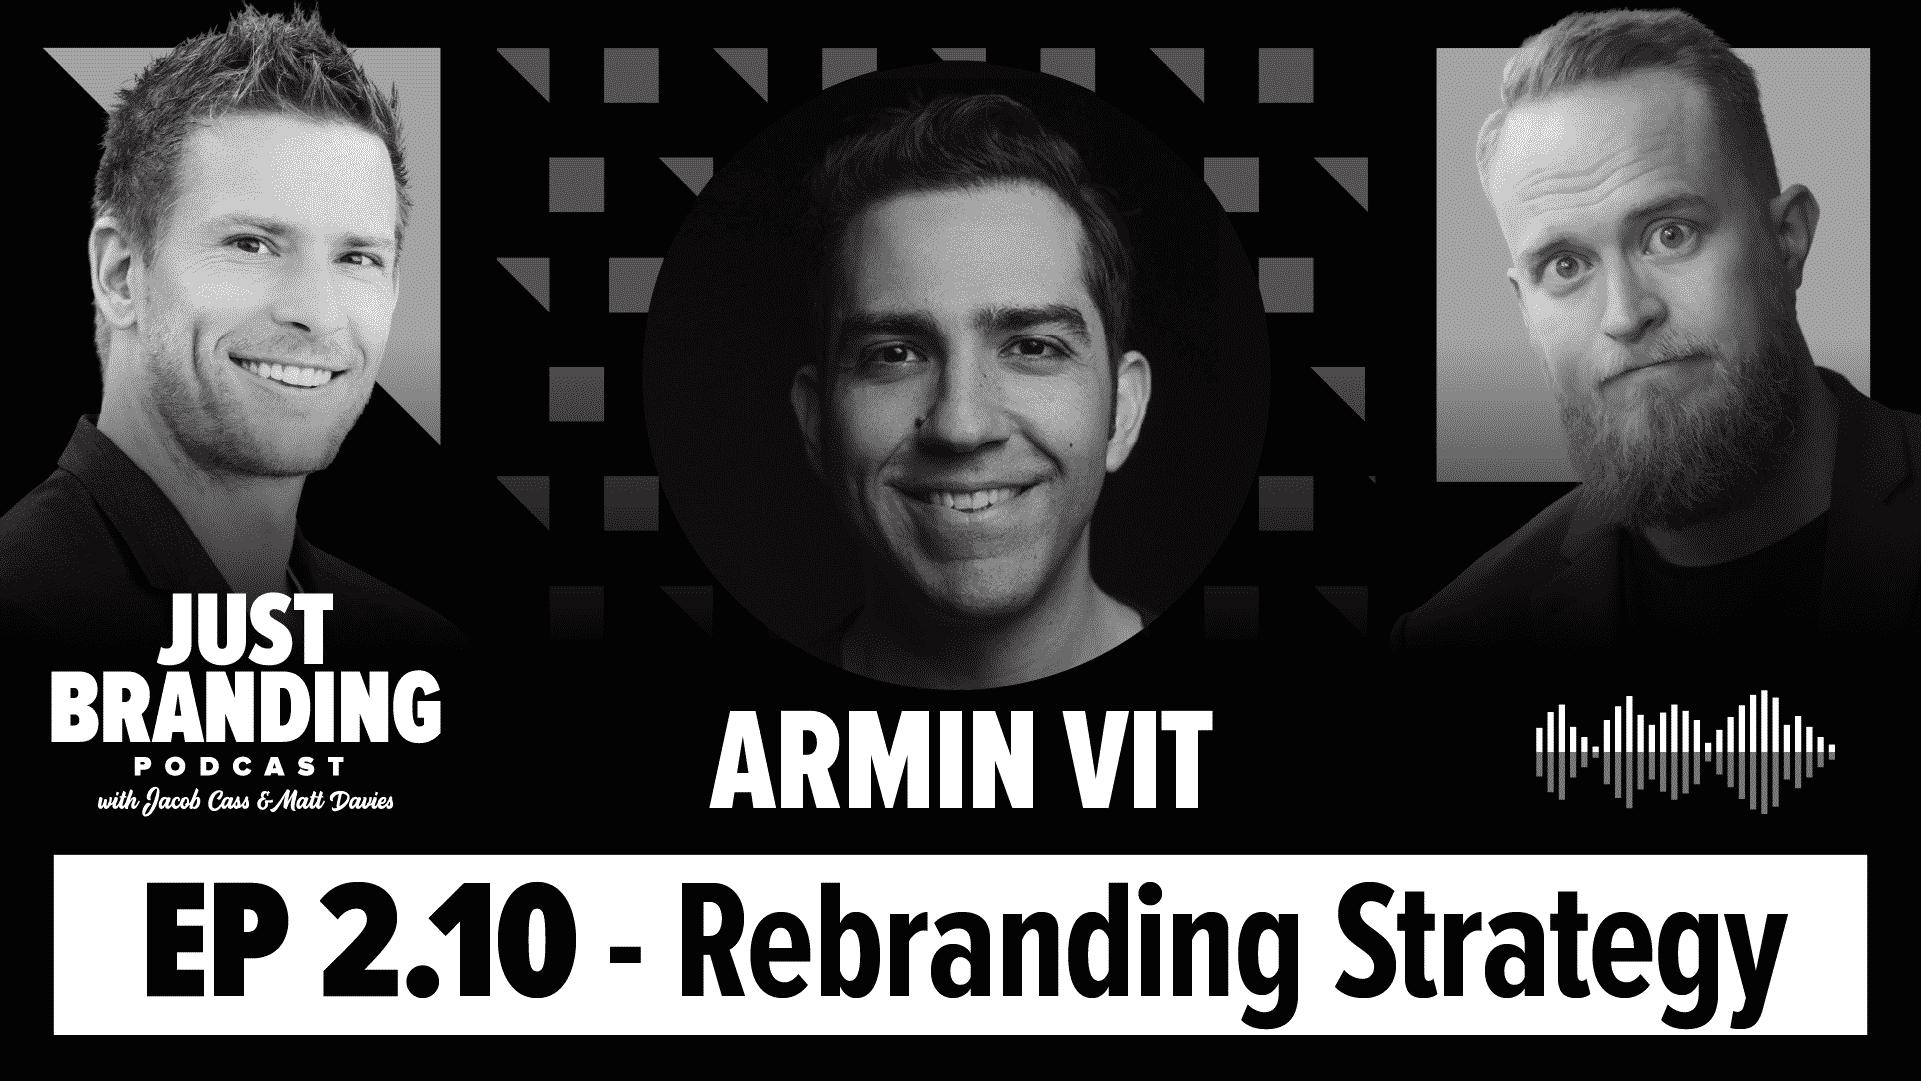 Rebranding Strategy